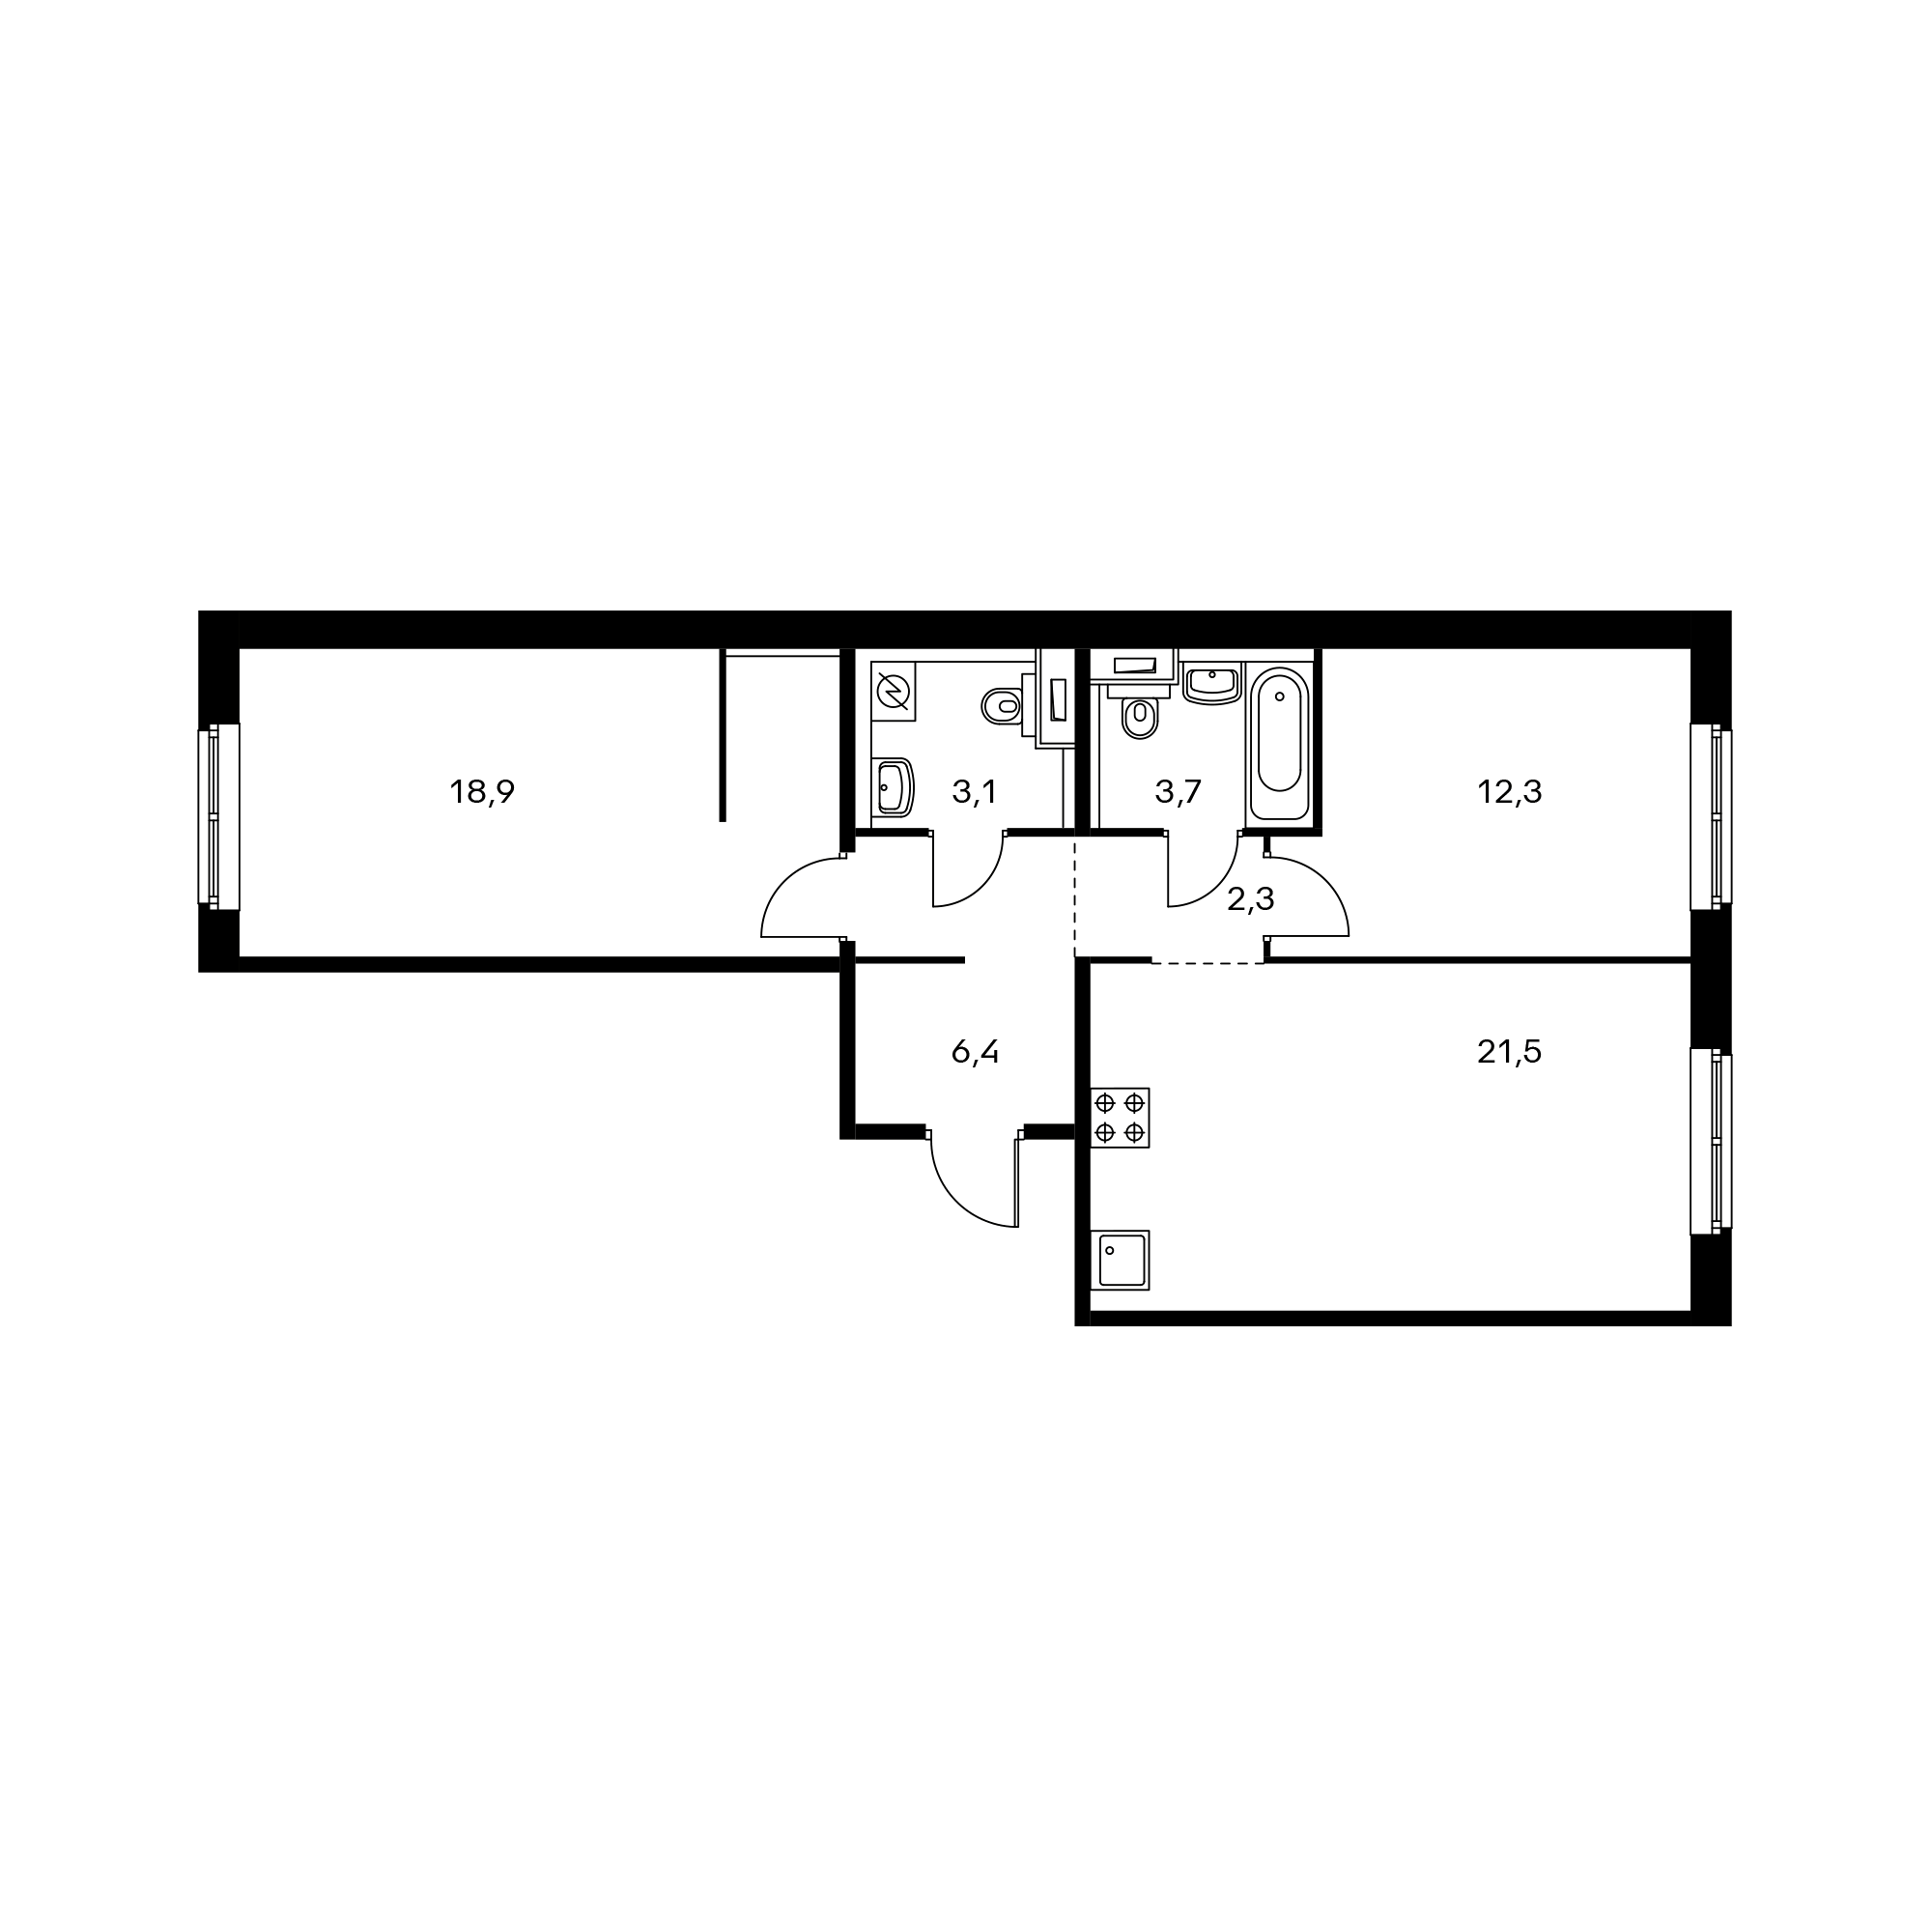 2EL3_6.9-2